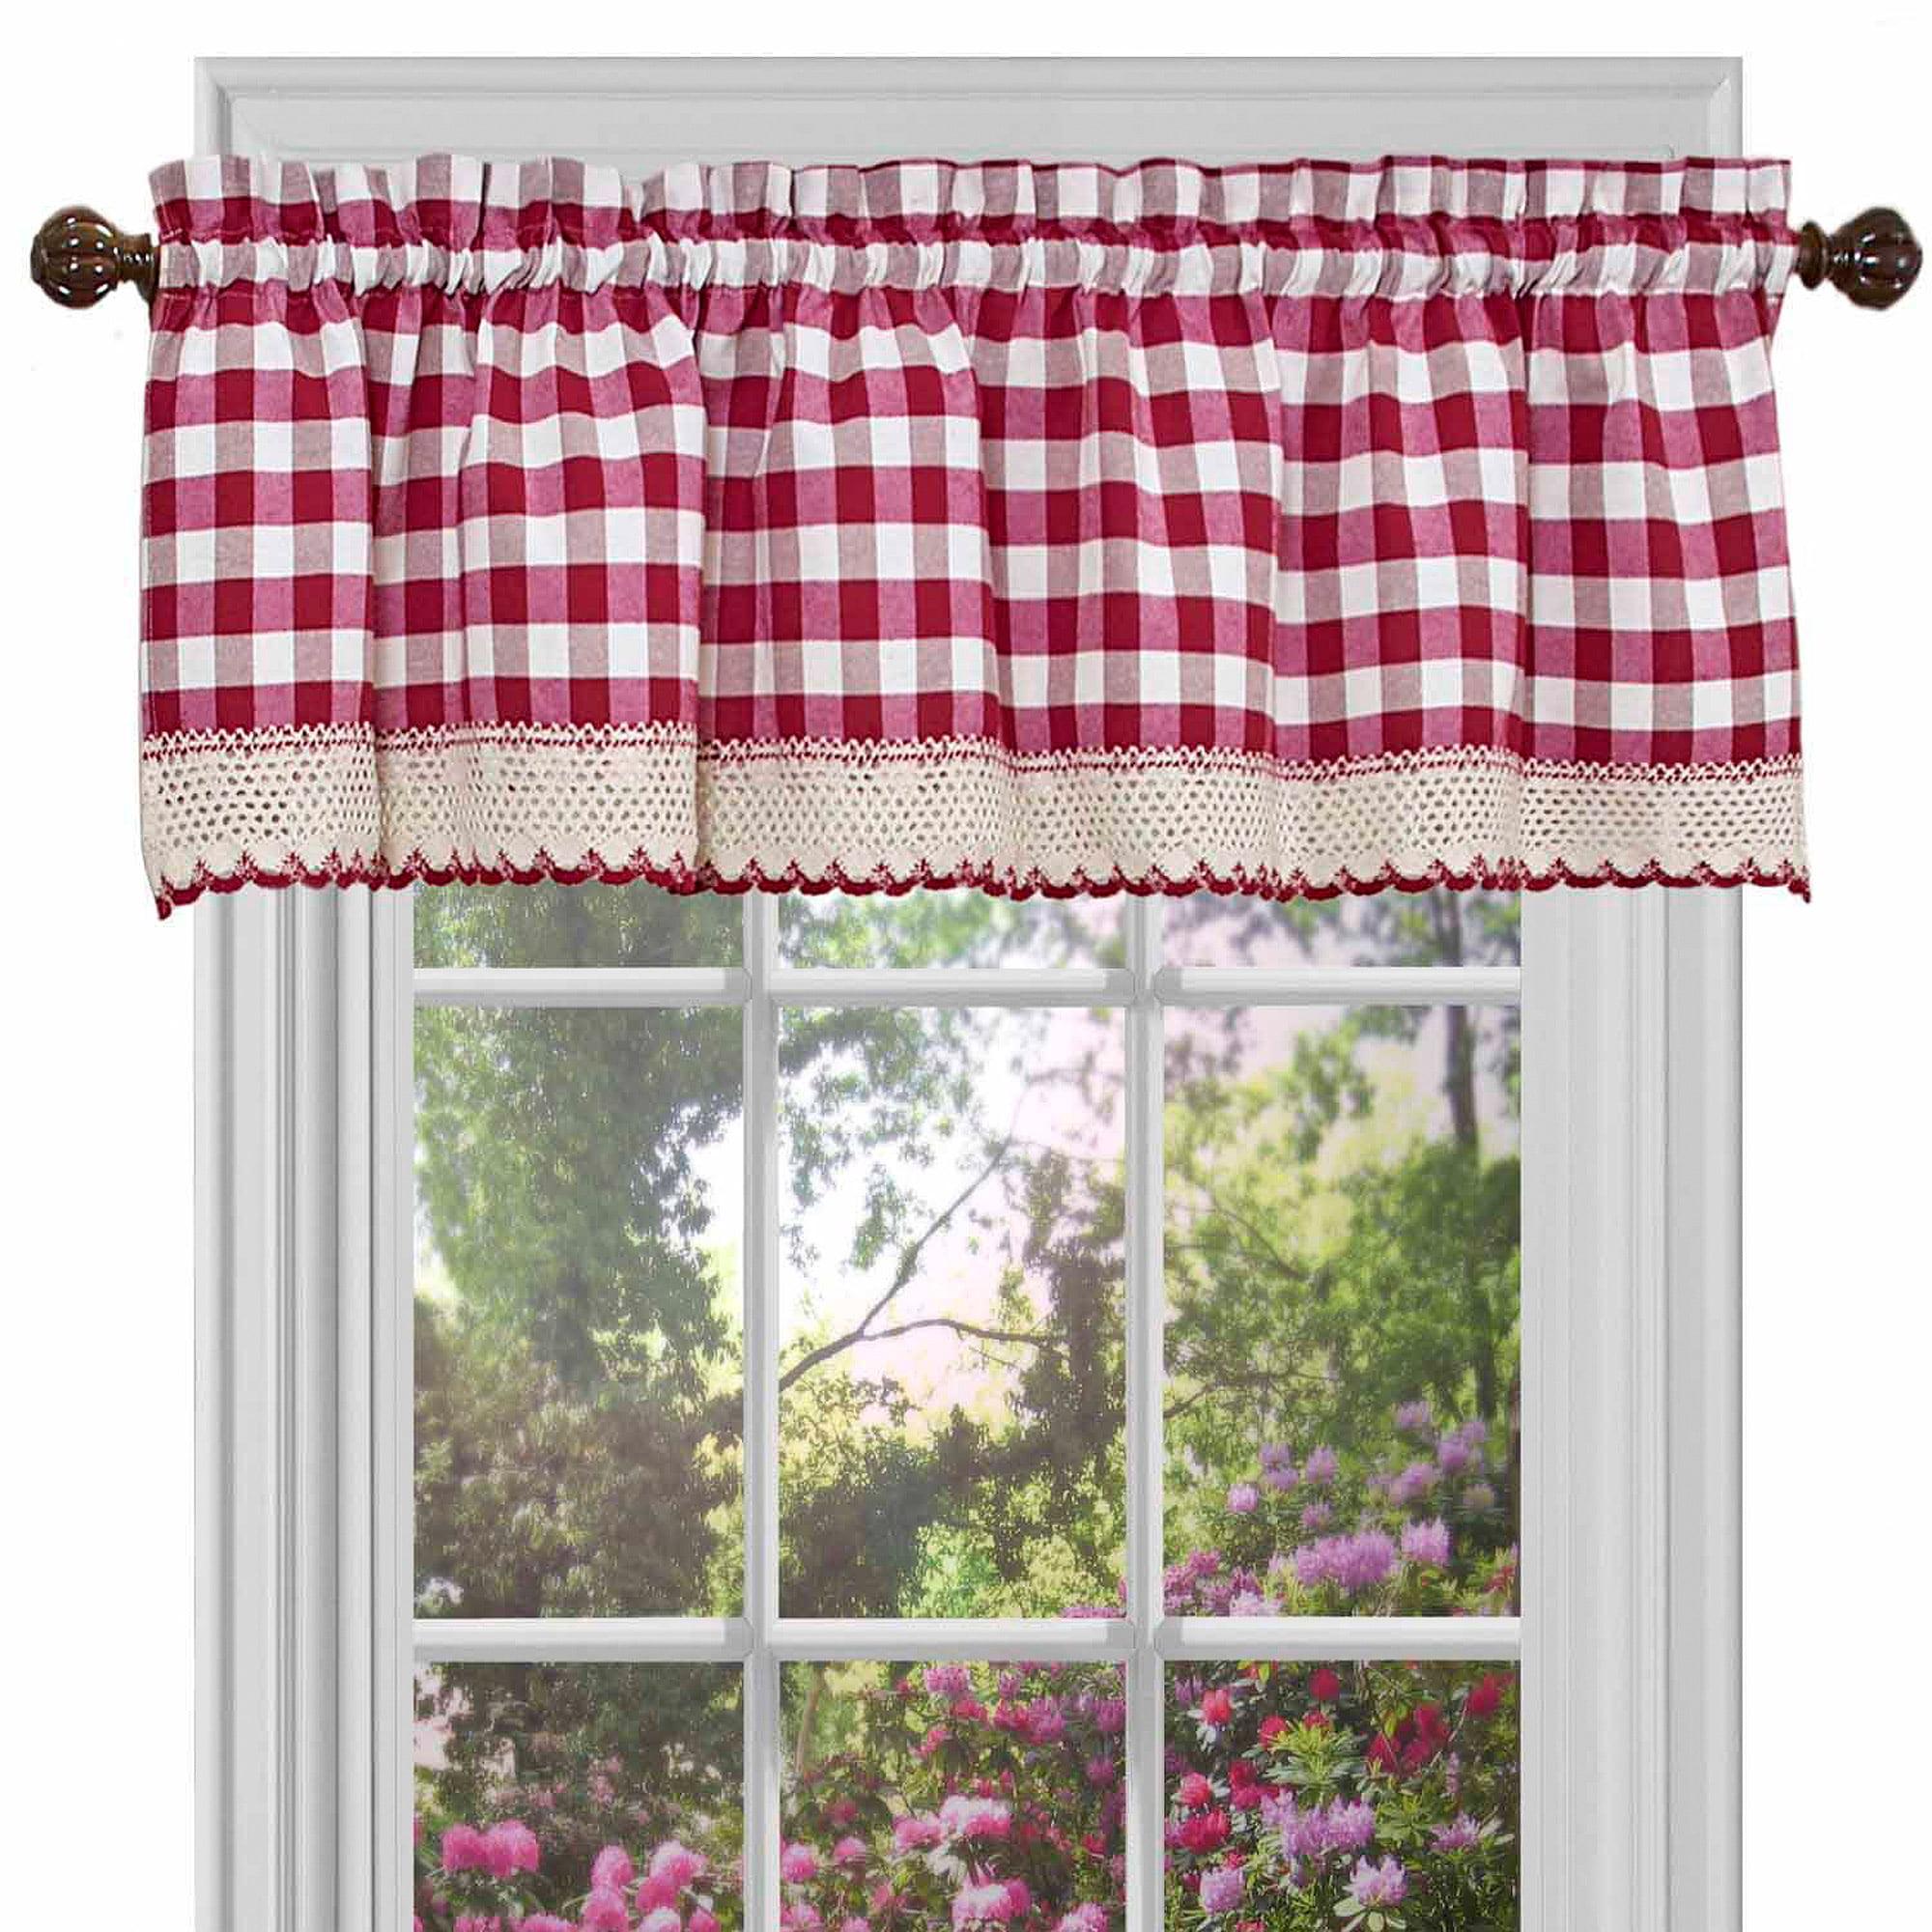 Buffalo Check Window Curtain Valance - 58x14